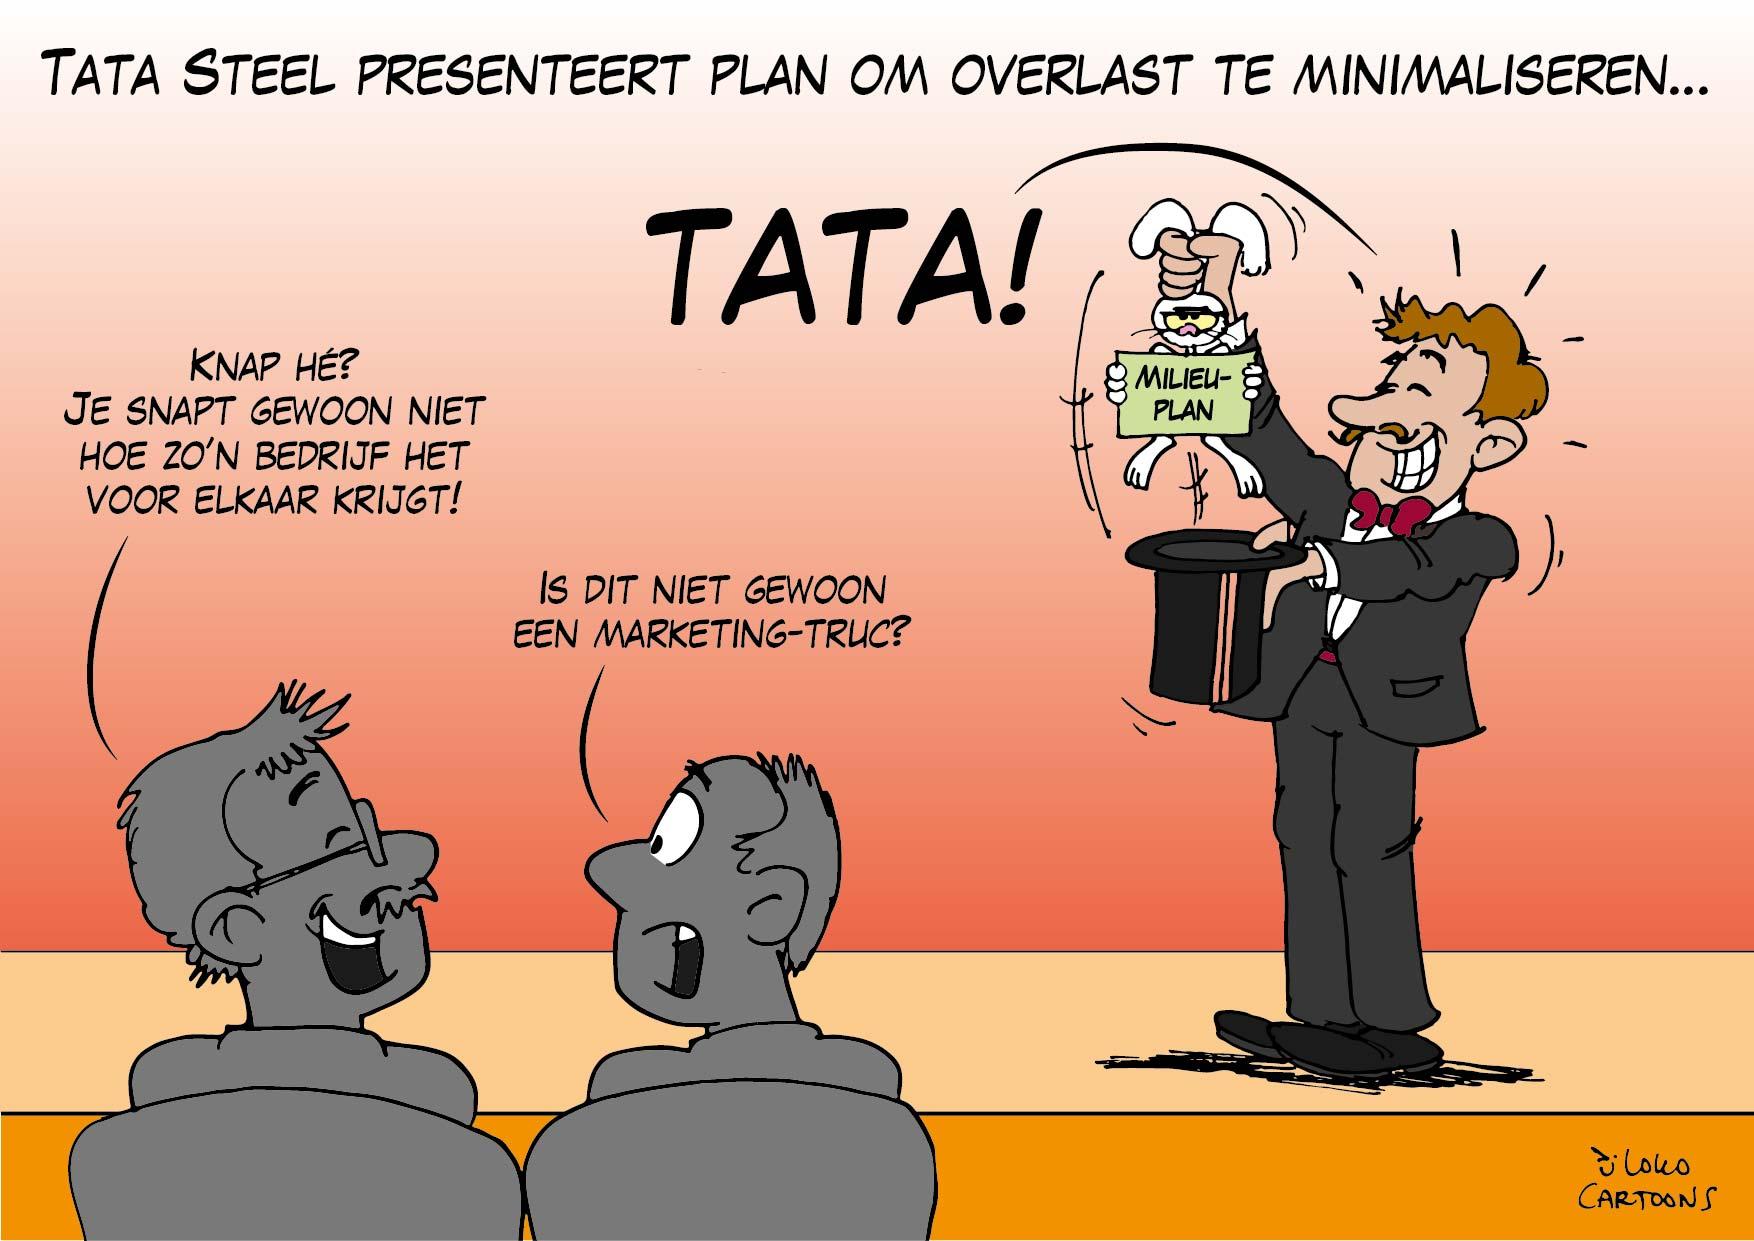 Tata Steel presenteert plan om overlast te minimaliseren…